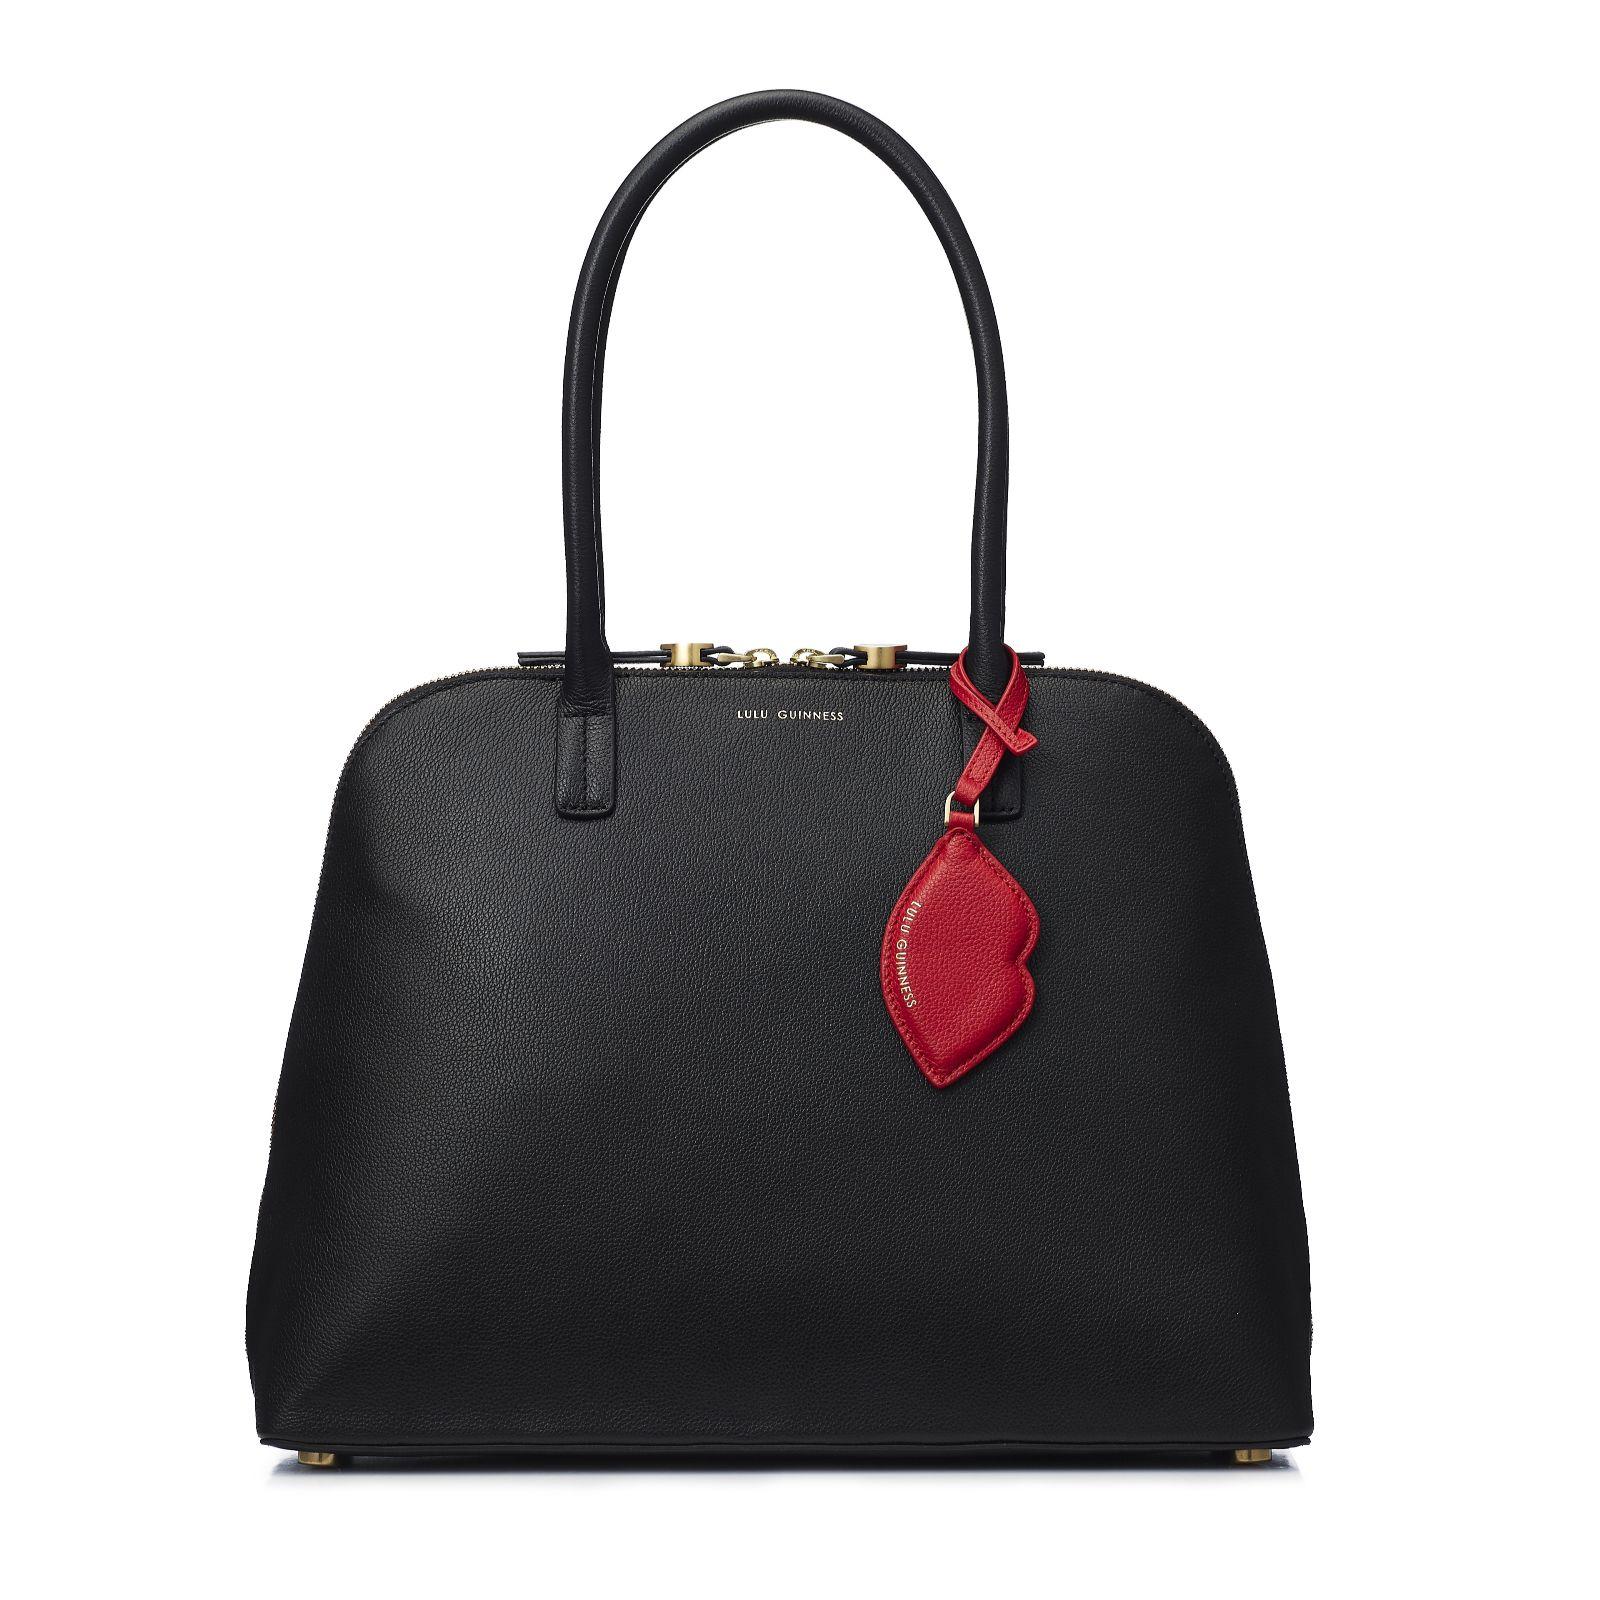 12f48da1a5 Lulu Guinness Bobbi Large Leather Shoulder Bag with Charm - QVC UK